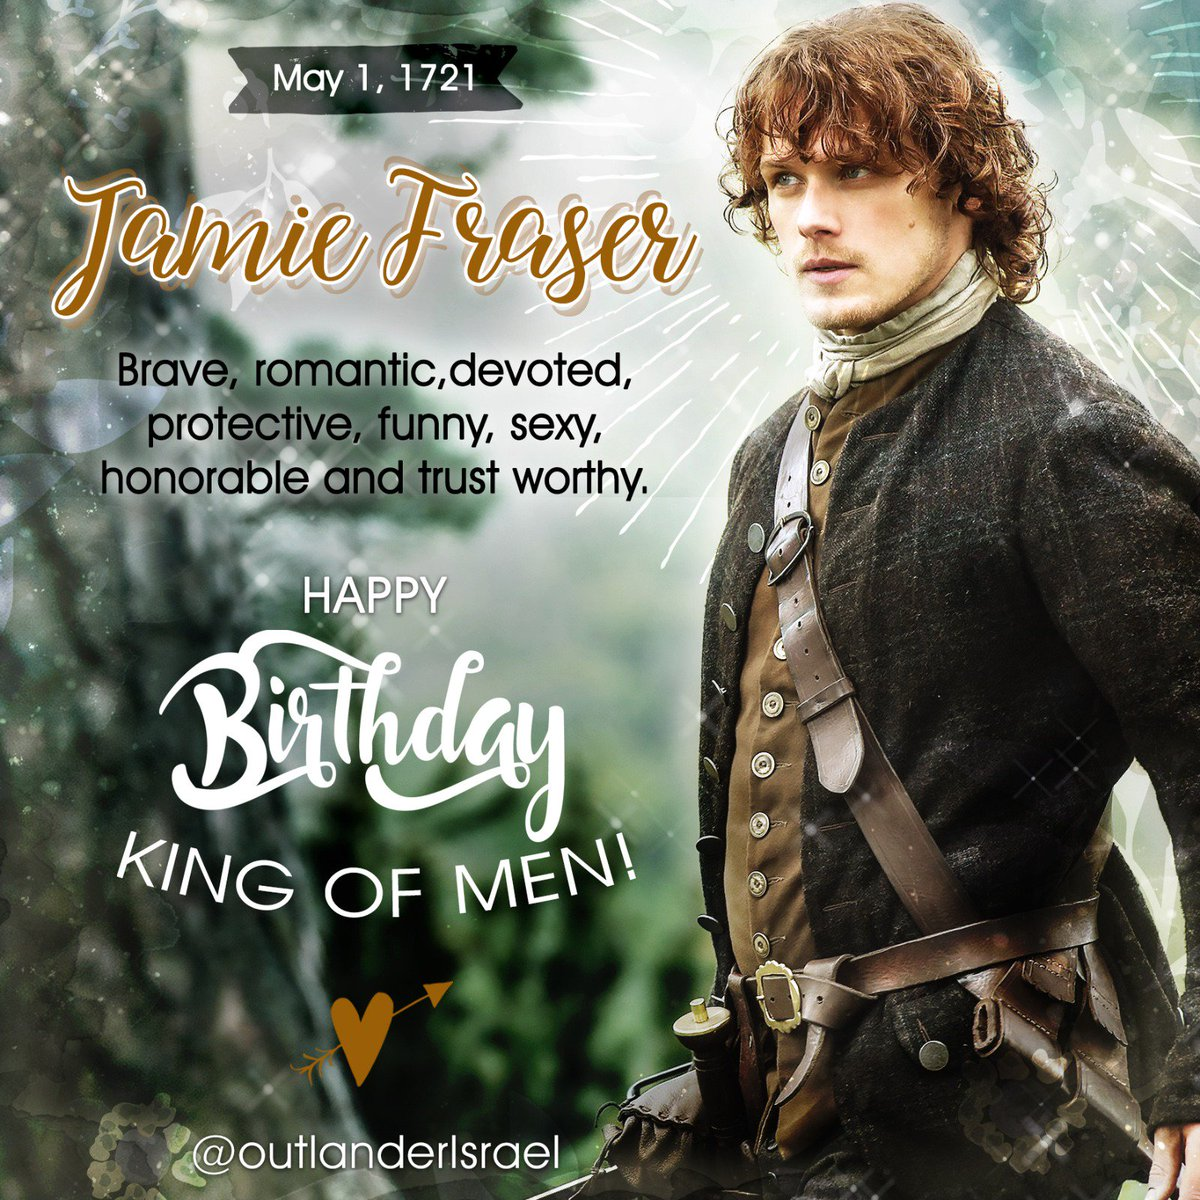 Happy birthday to our #kingofmen, Mr  James Alexander